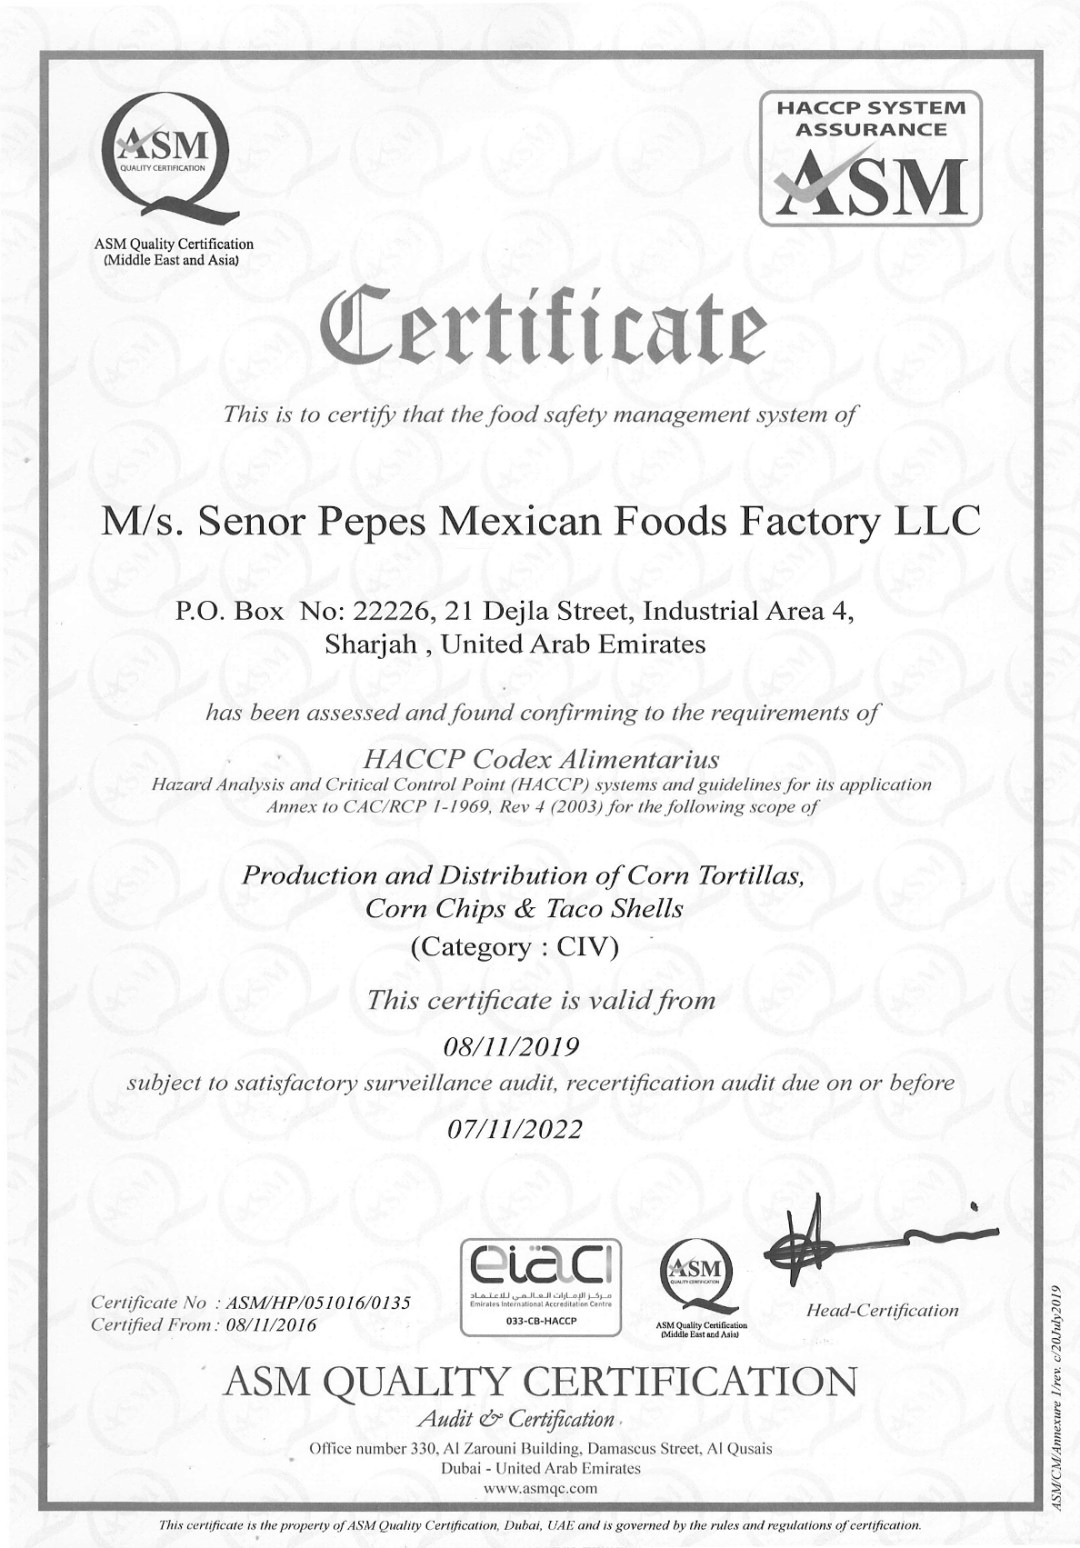 HACCP-SHJ-2022 Certification